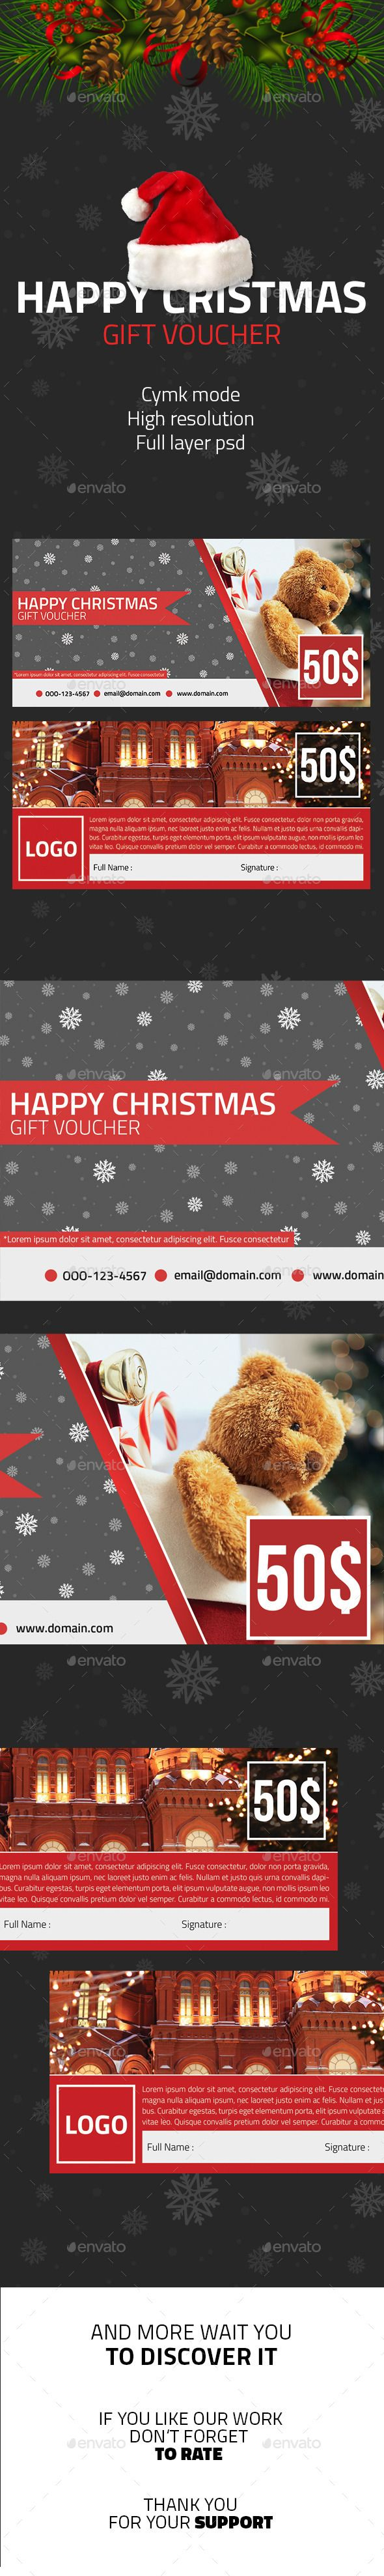 Happy Christmas Voucher Gift